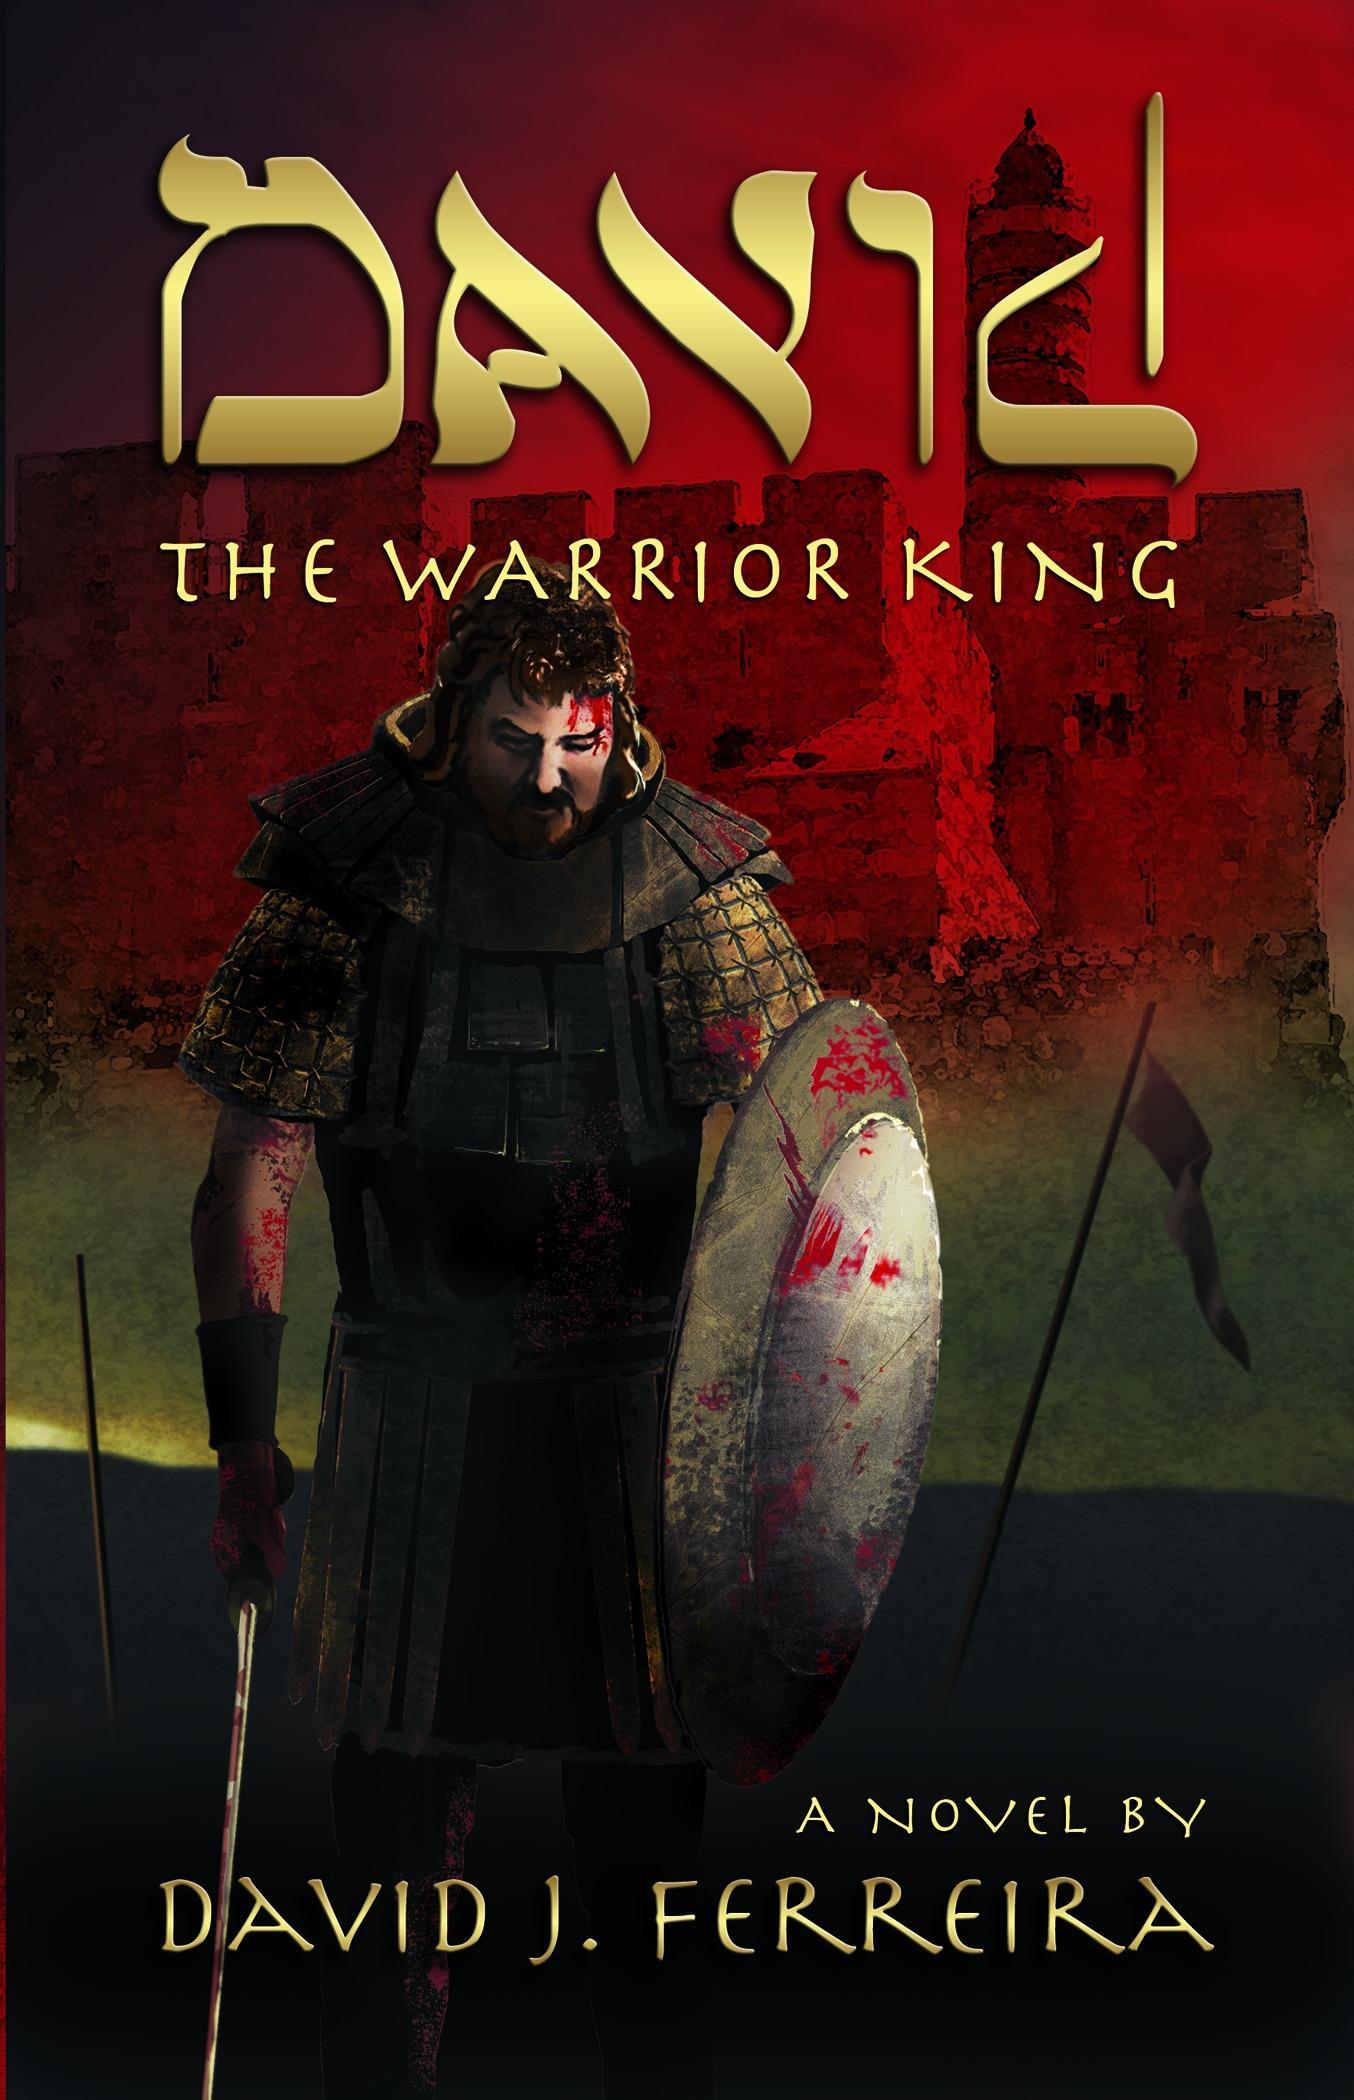 David: The Warrior King